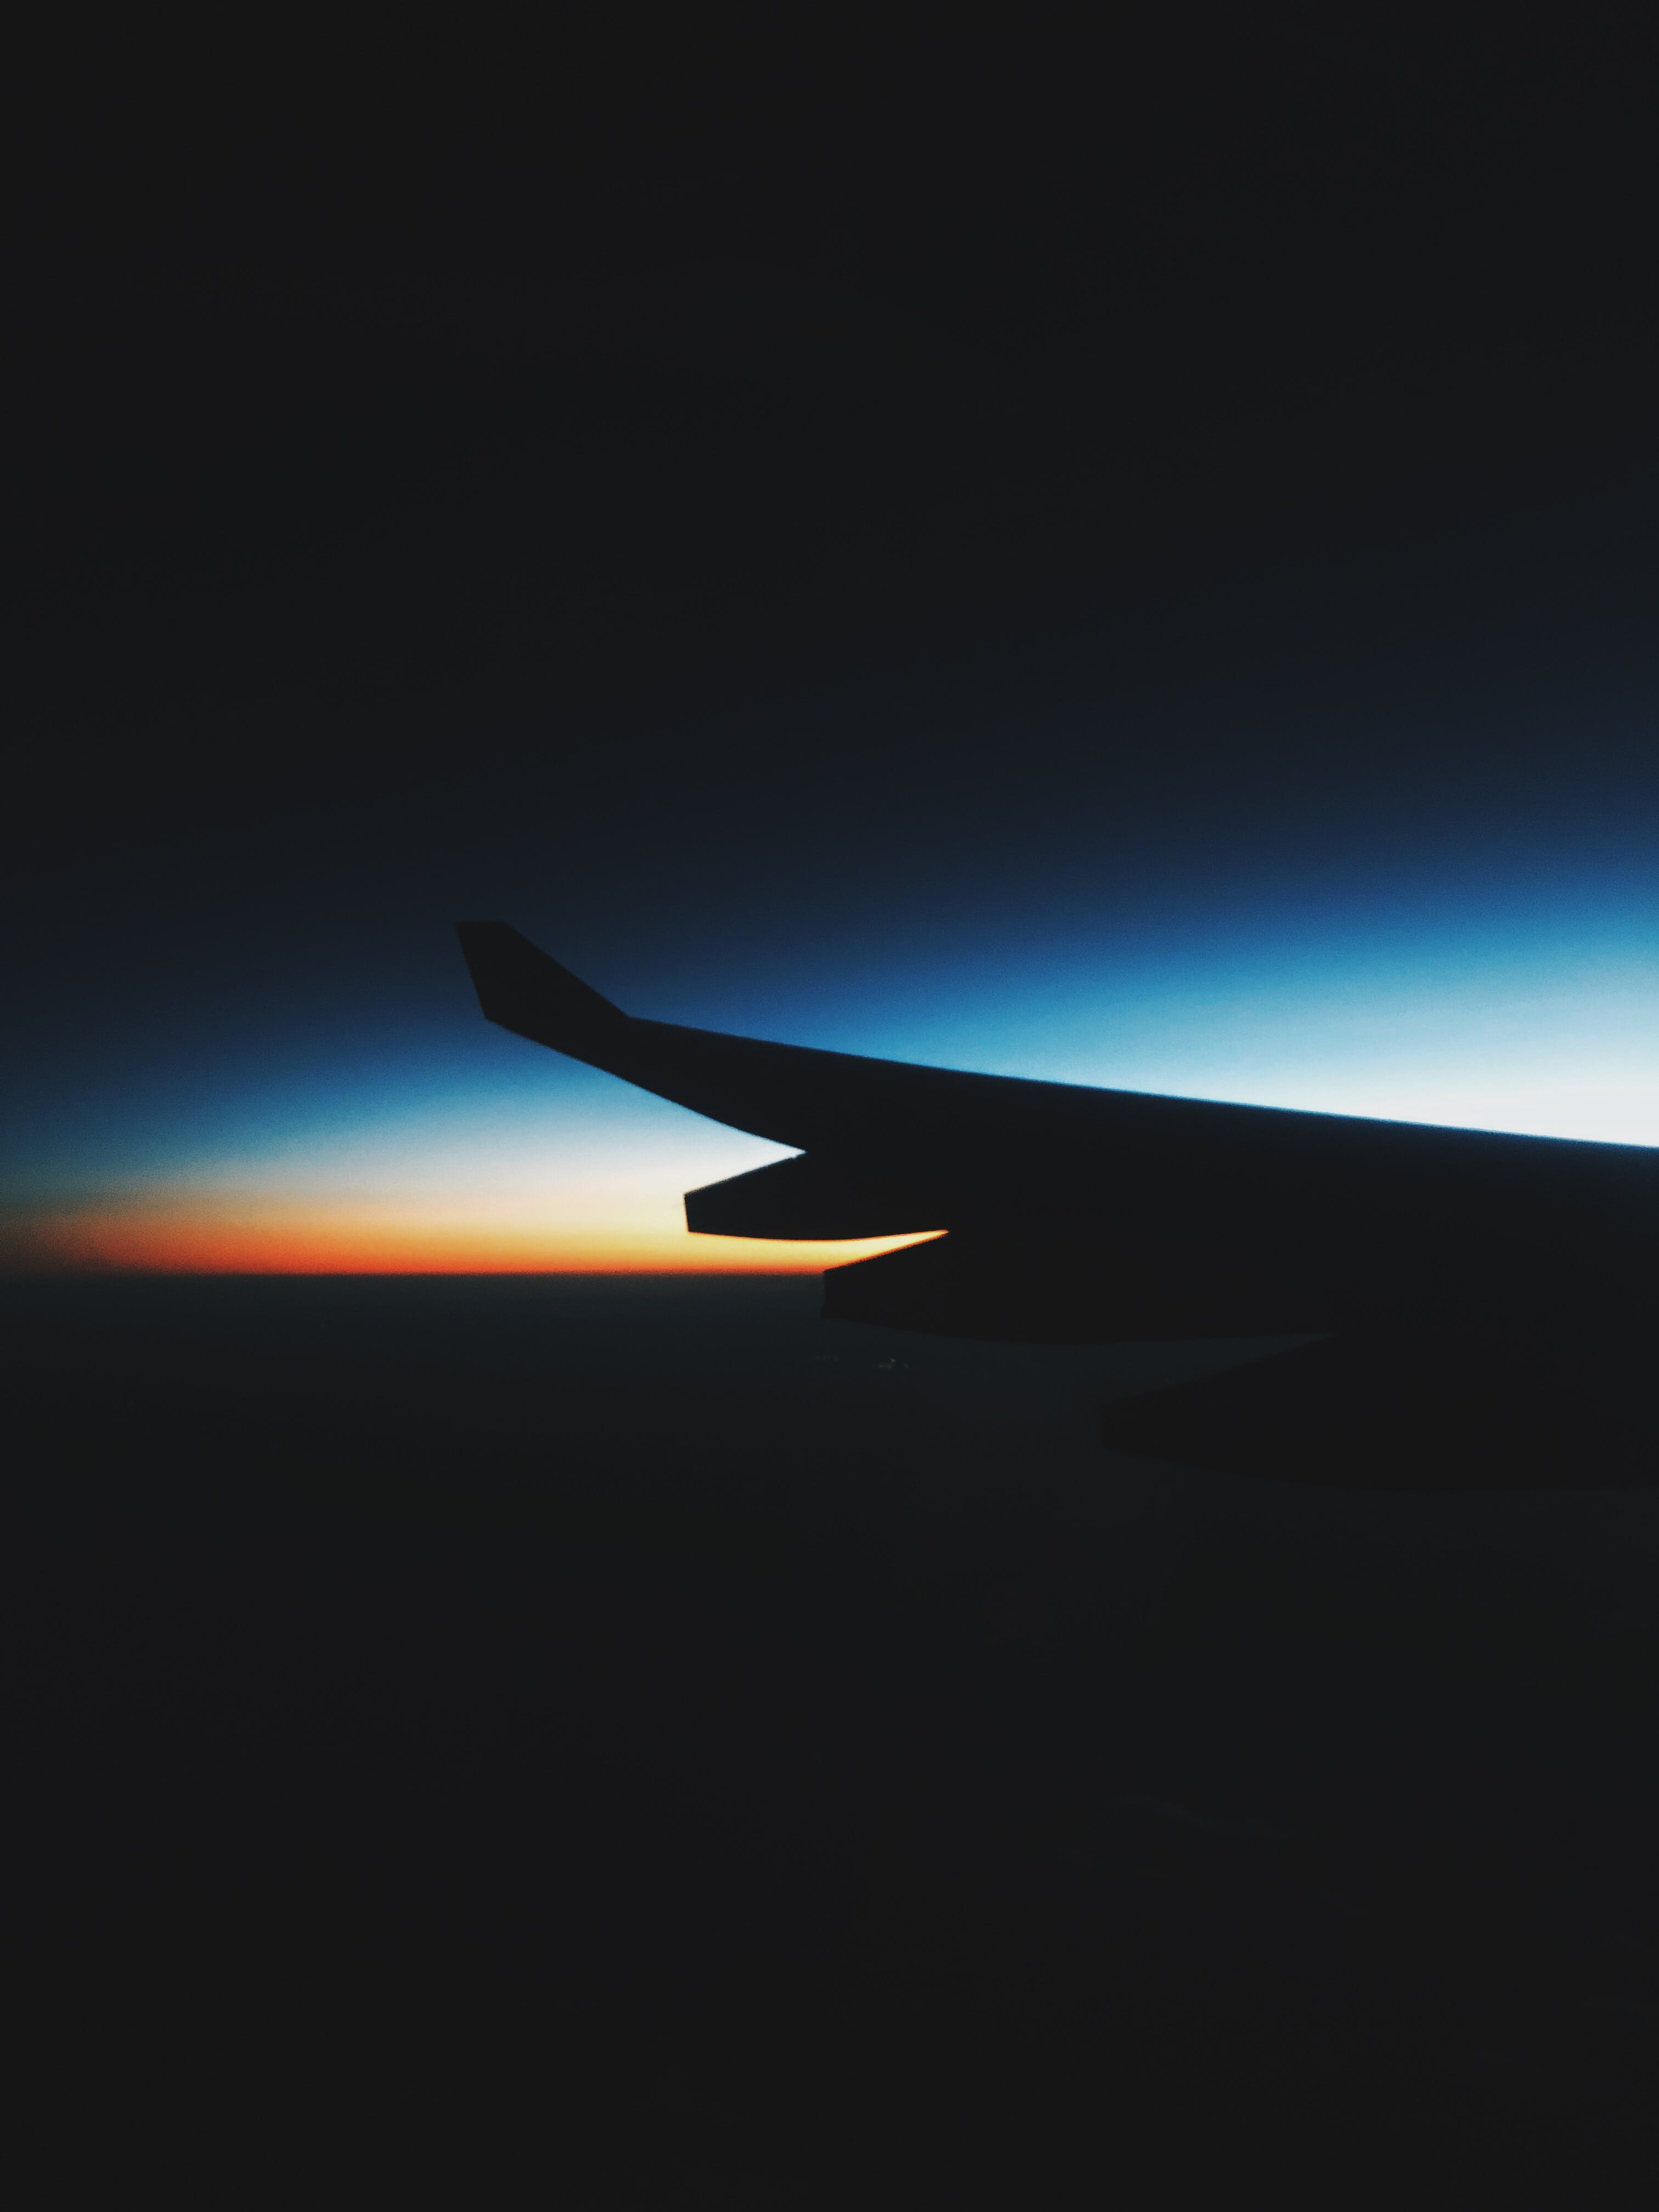 Free stock photo of blue sky, flight, morning light, morning sun